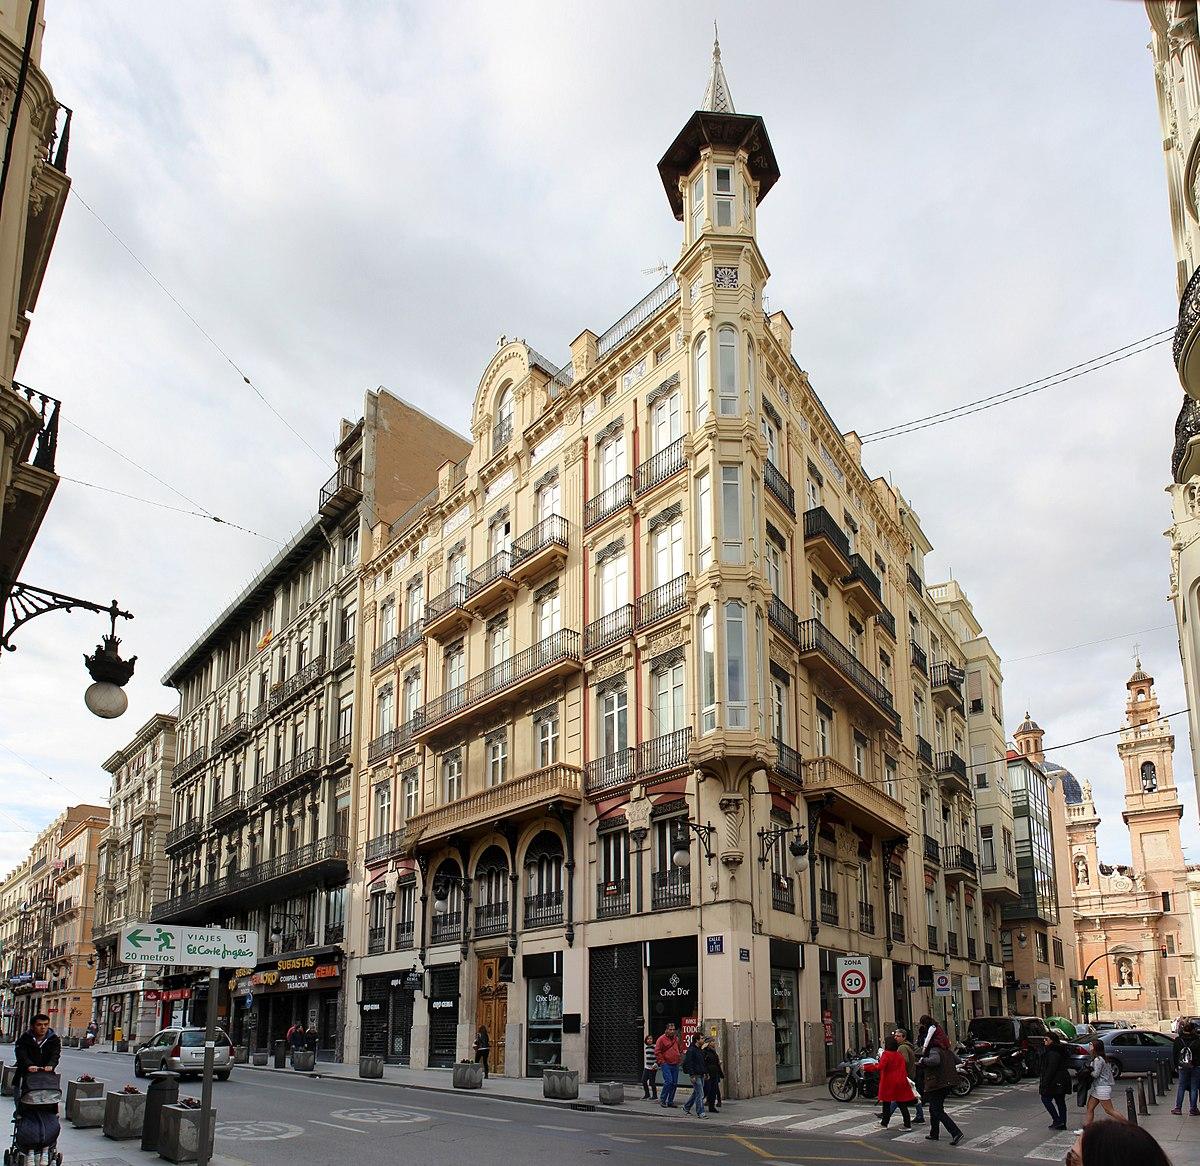 1200px-Casa_Sancho_de_Joaqu%C3%ADn_Mar%C3%ADa_Arnau_Miram%C3%B3n_%281901%29_en_Valencia.jpg